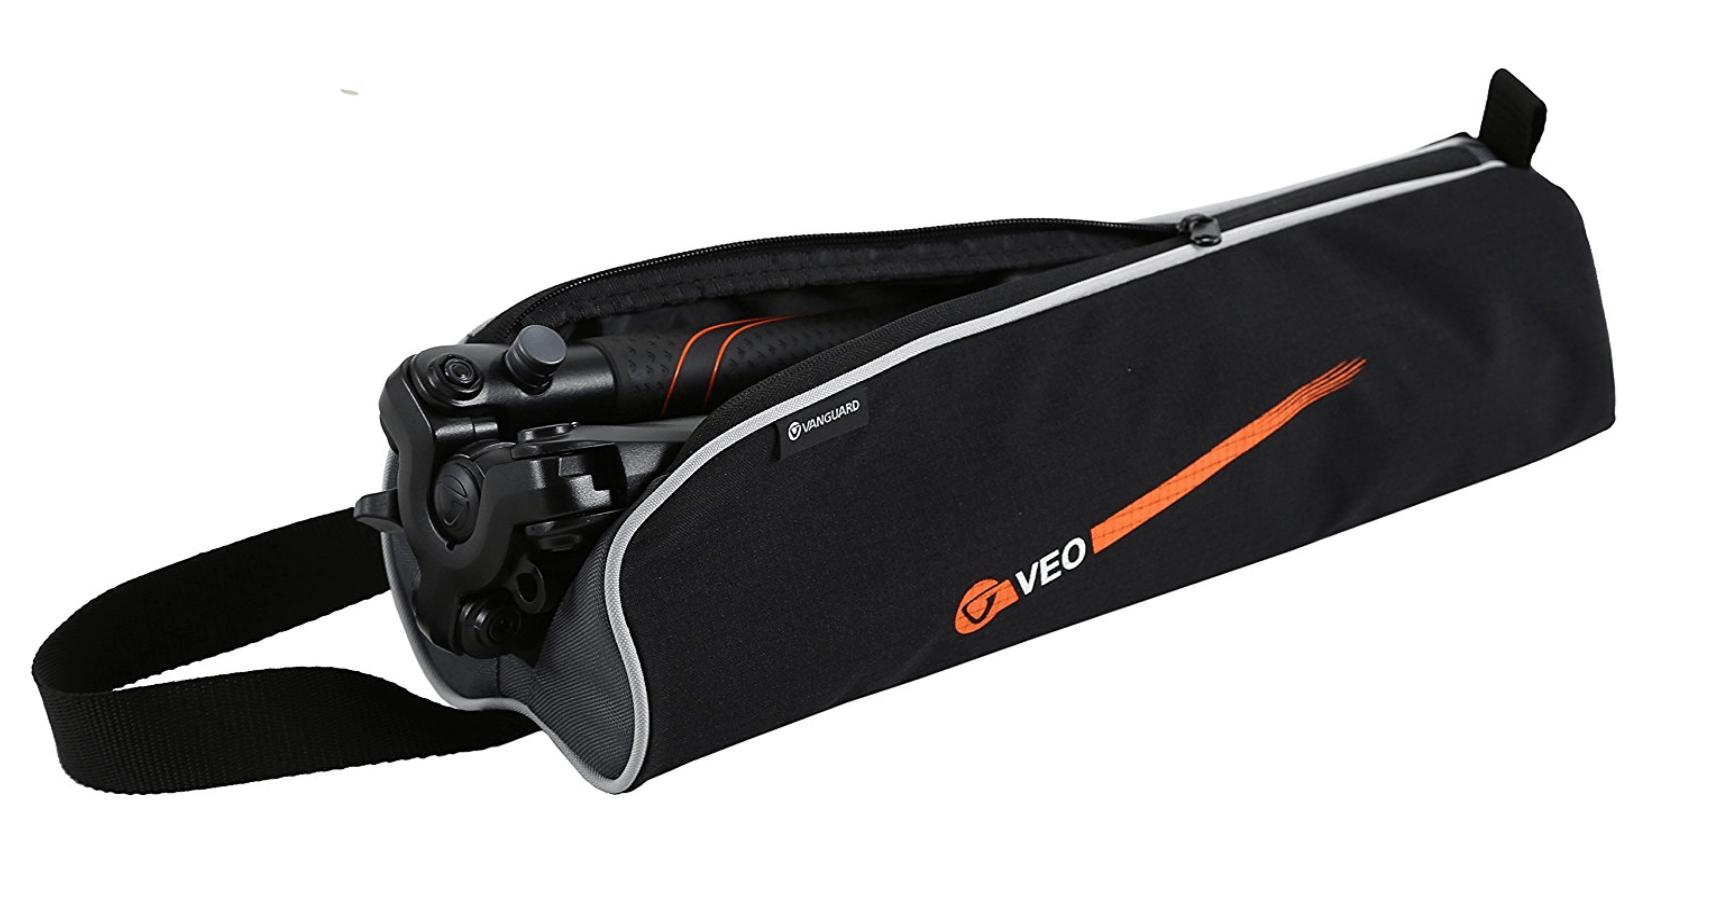 Vanguard Veo 204AB, treppiedi